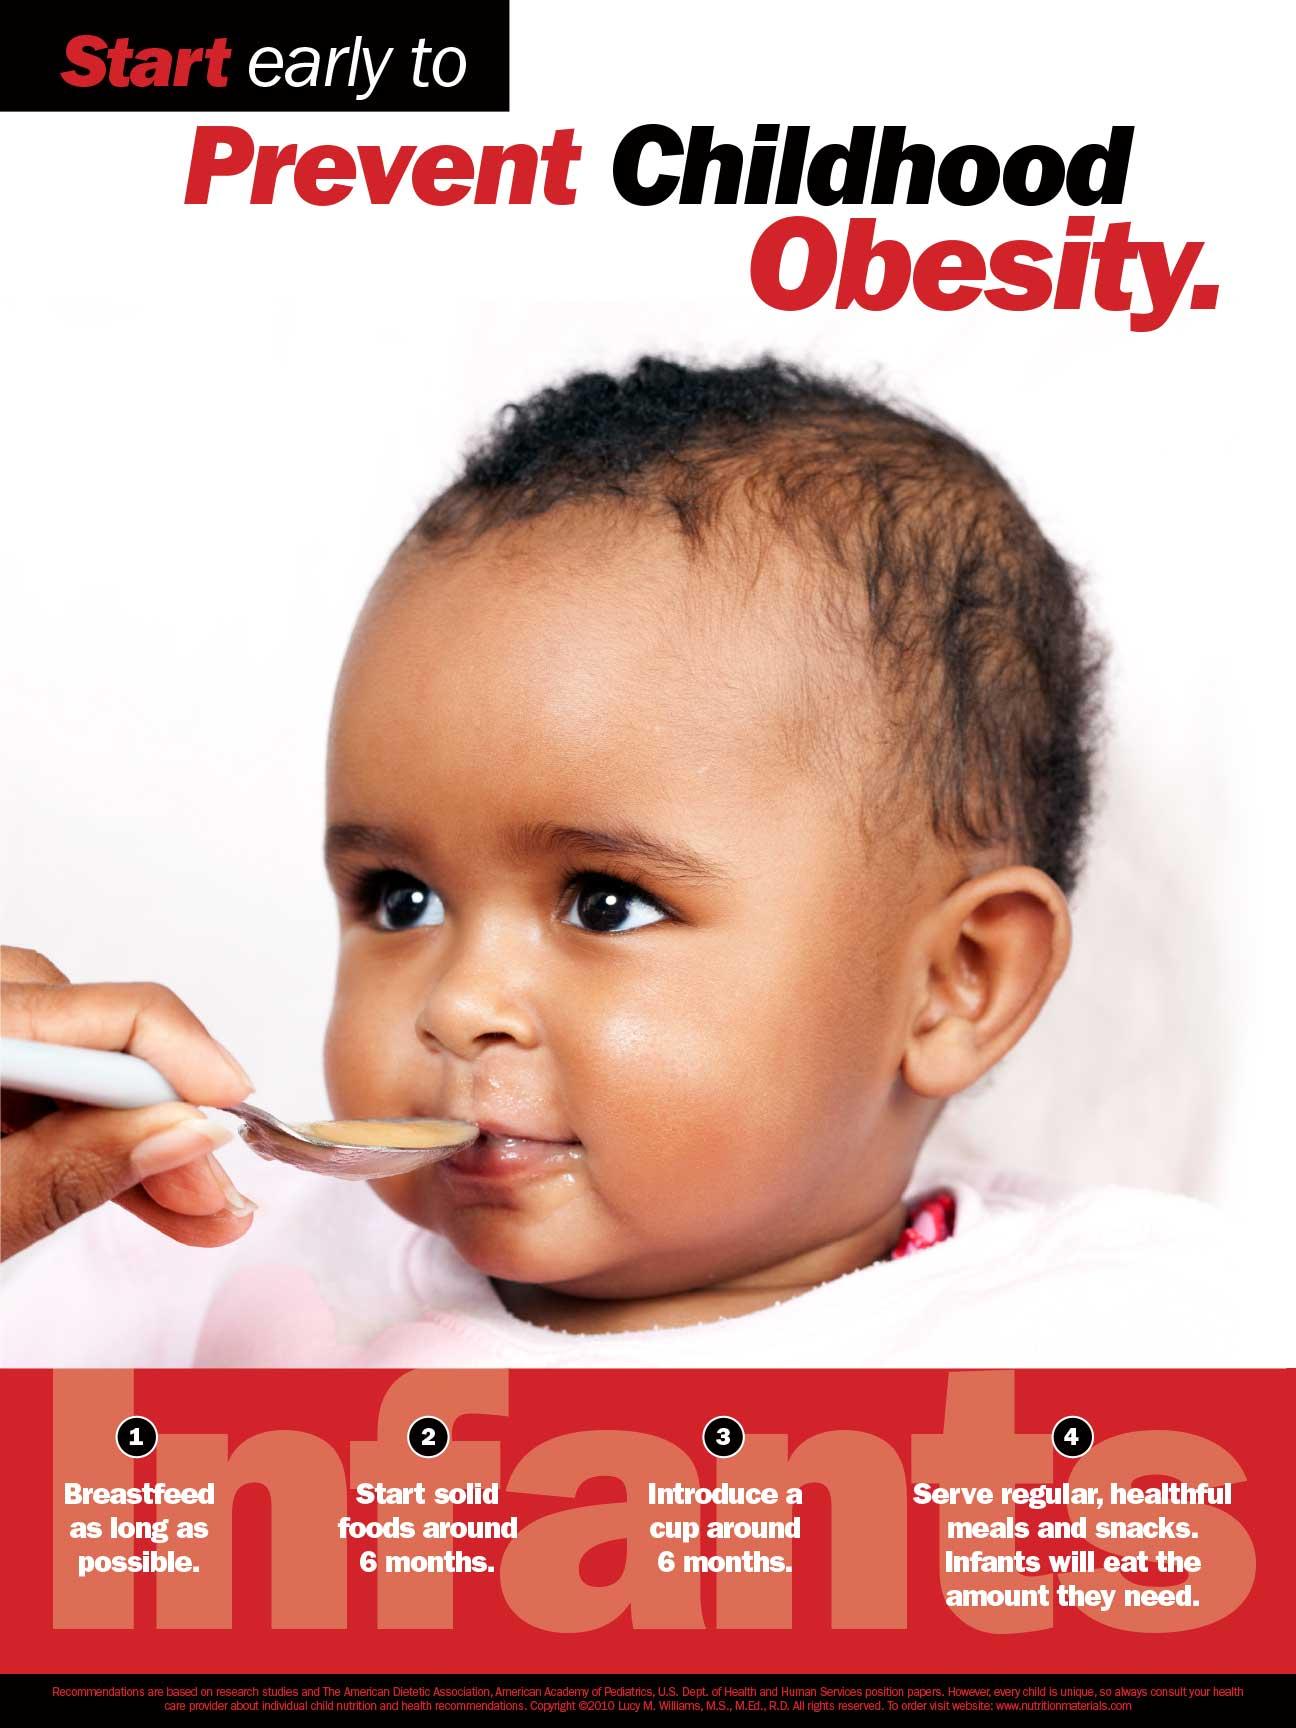 ObesityInfantSampleFinal